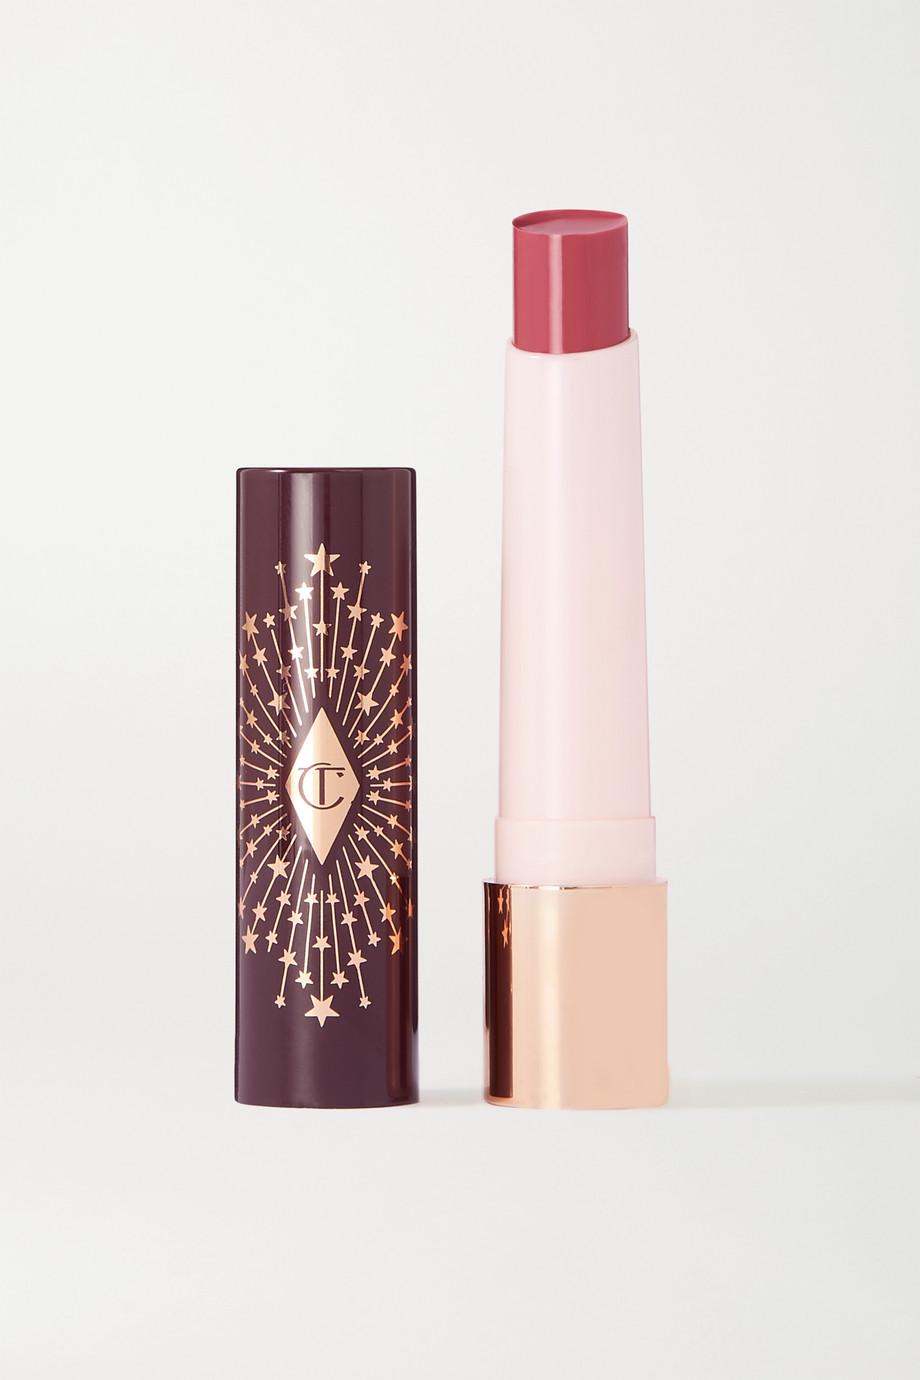 Charlotte Tilbury Hyaluronic Happikiss Lipstick Balm - Romance Kiss